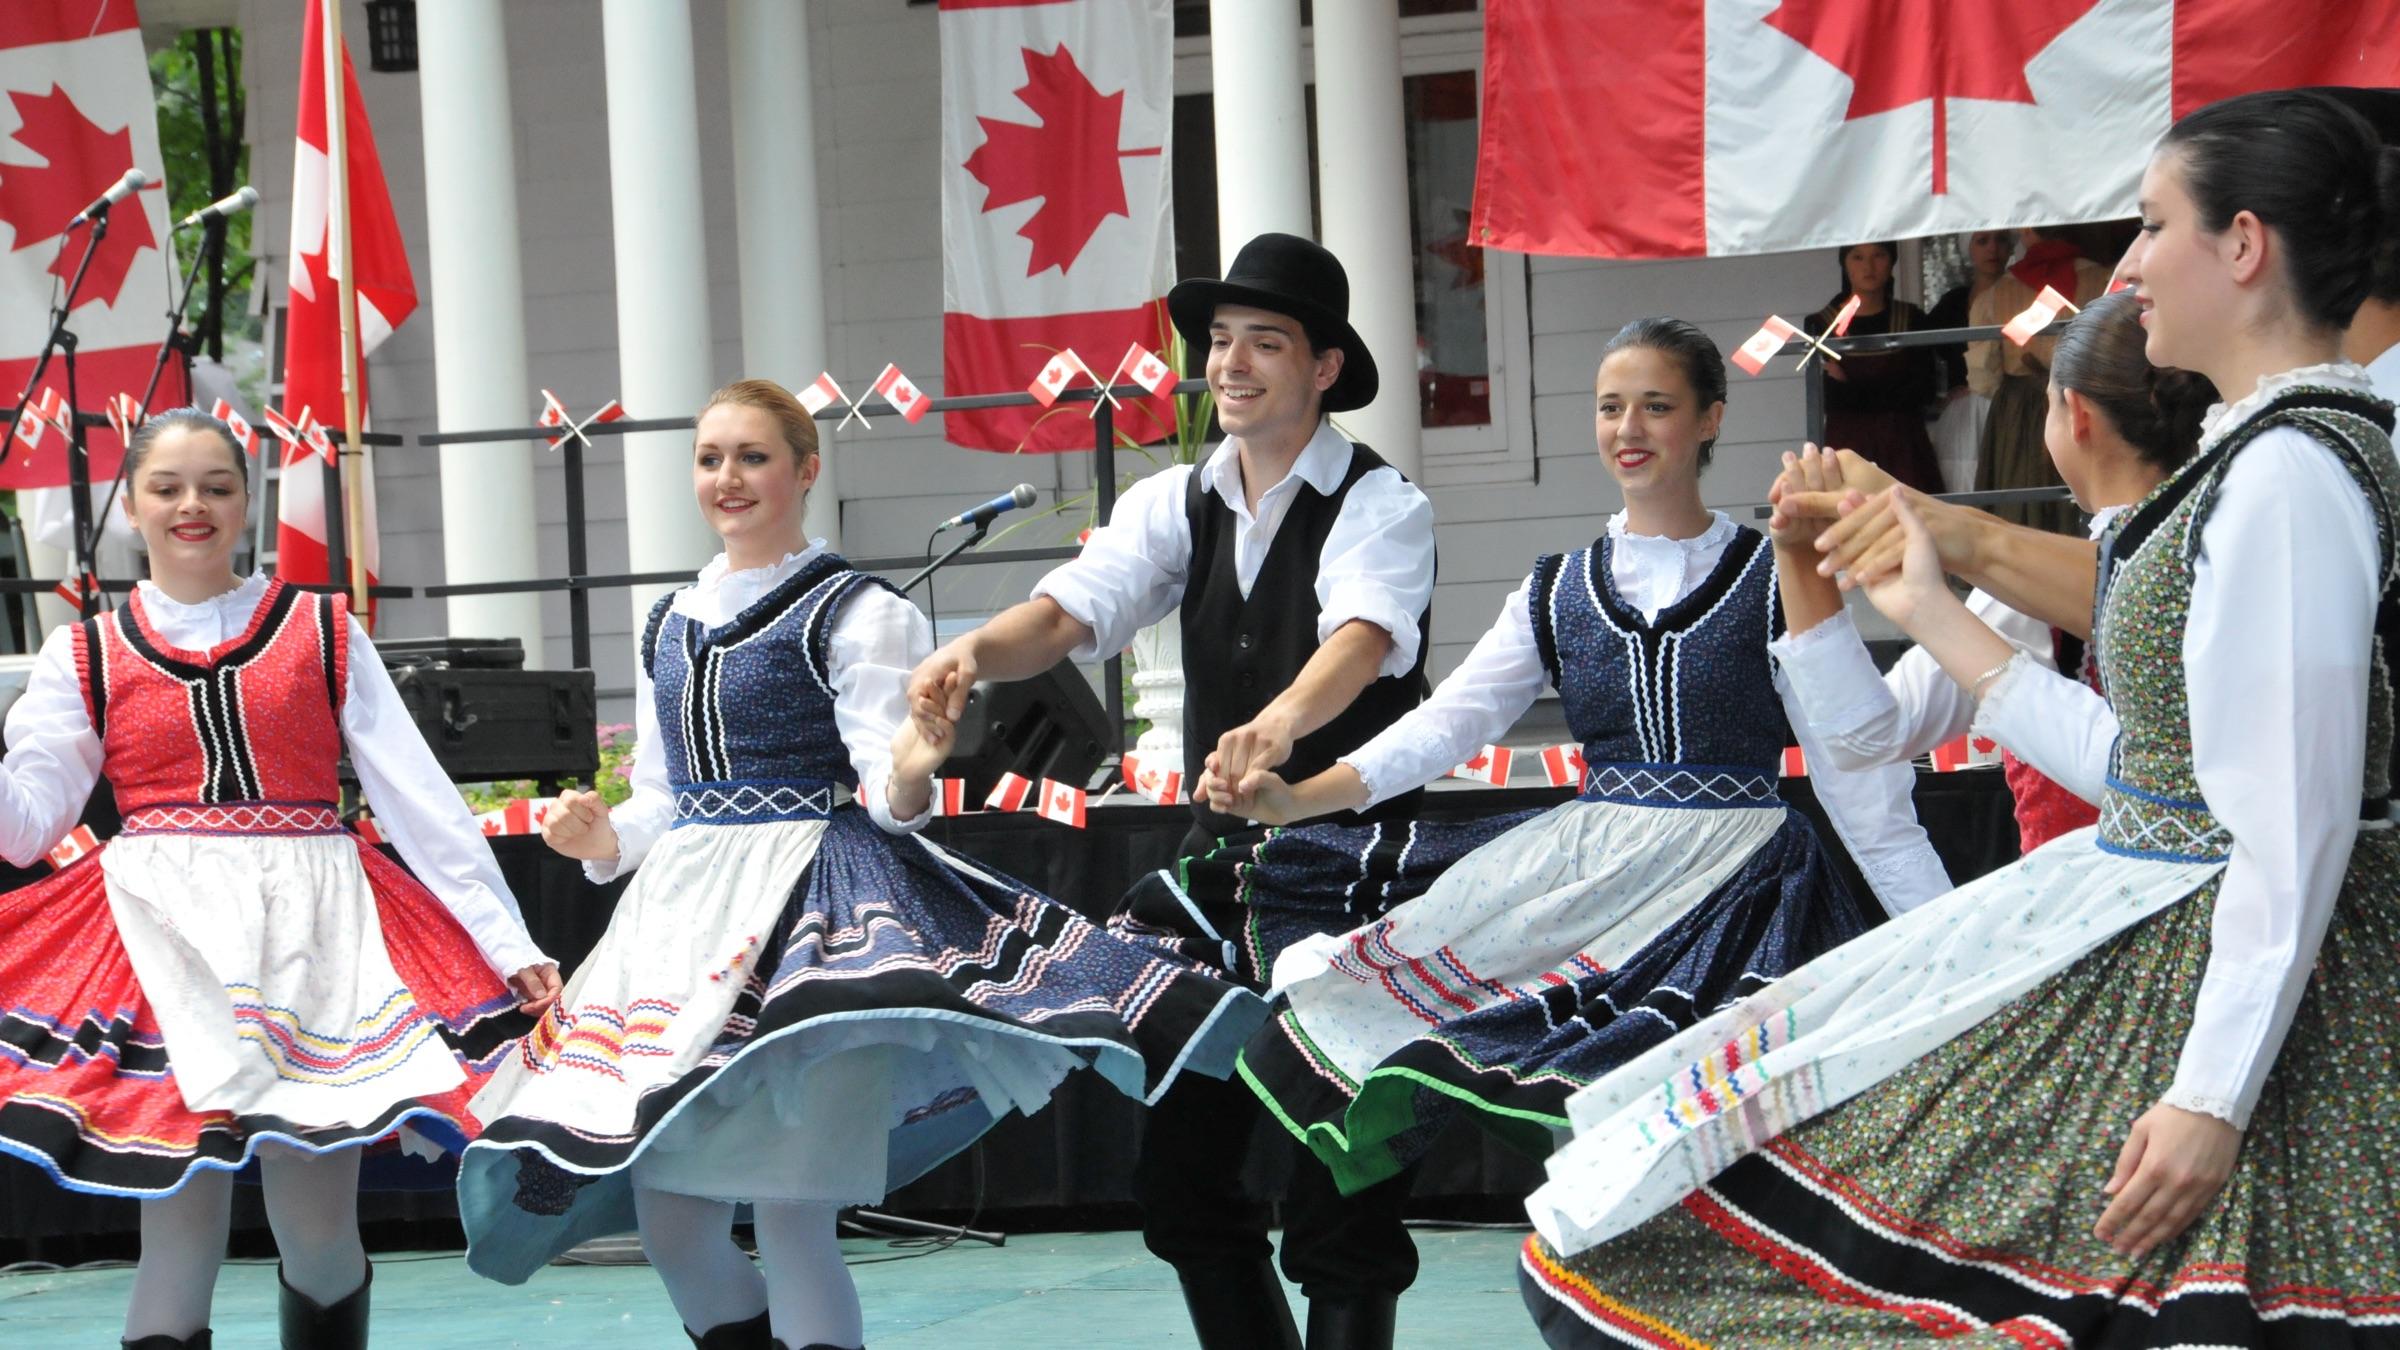 Fête du Canada (Beaconsfield), 2011